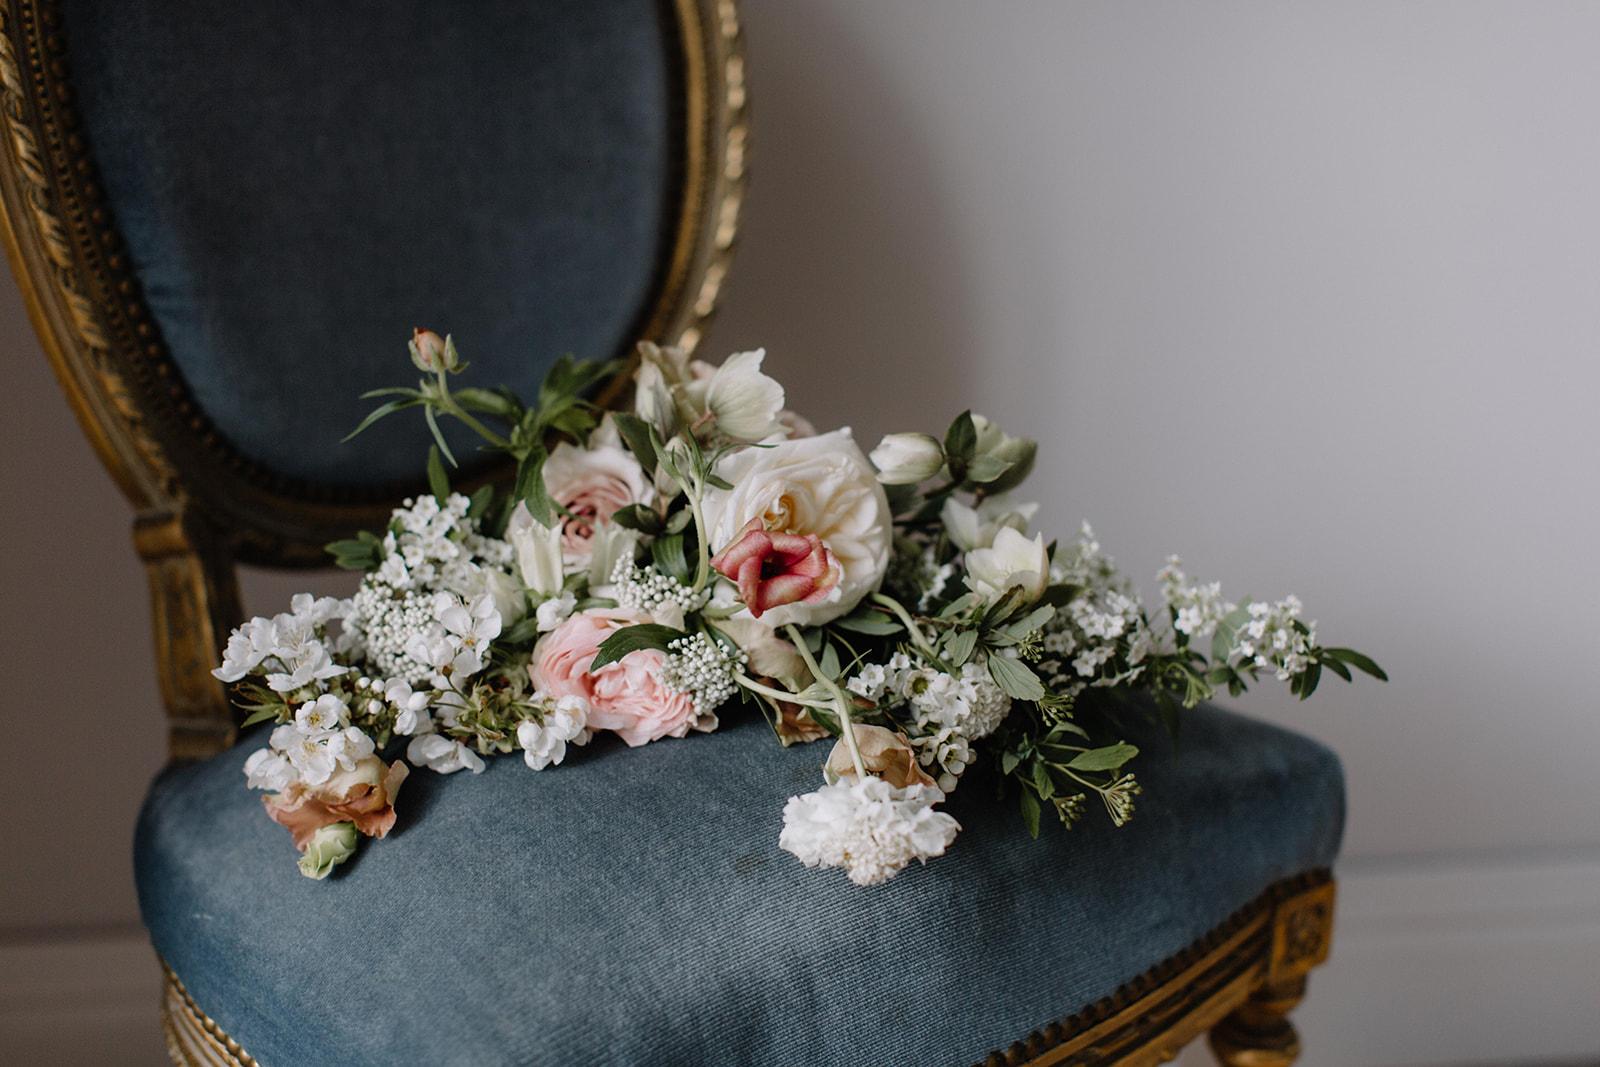 Cotswolds wedding planner | Understated weddings planned by Mirabella Weddings